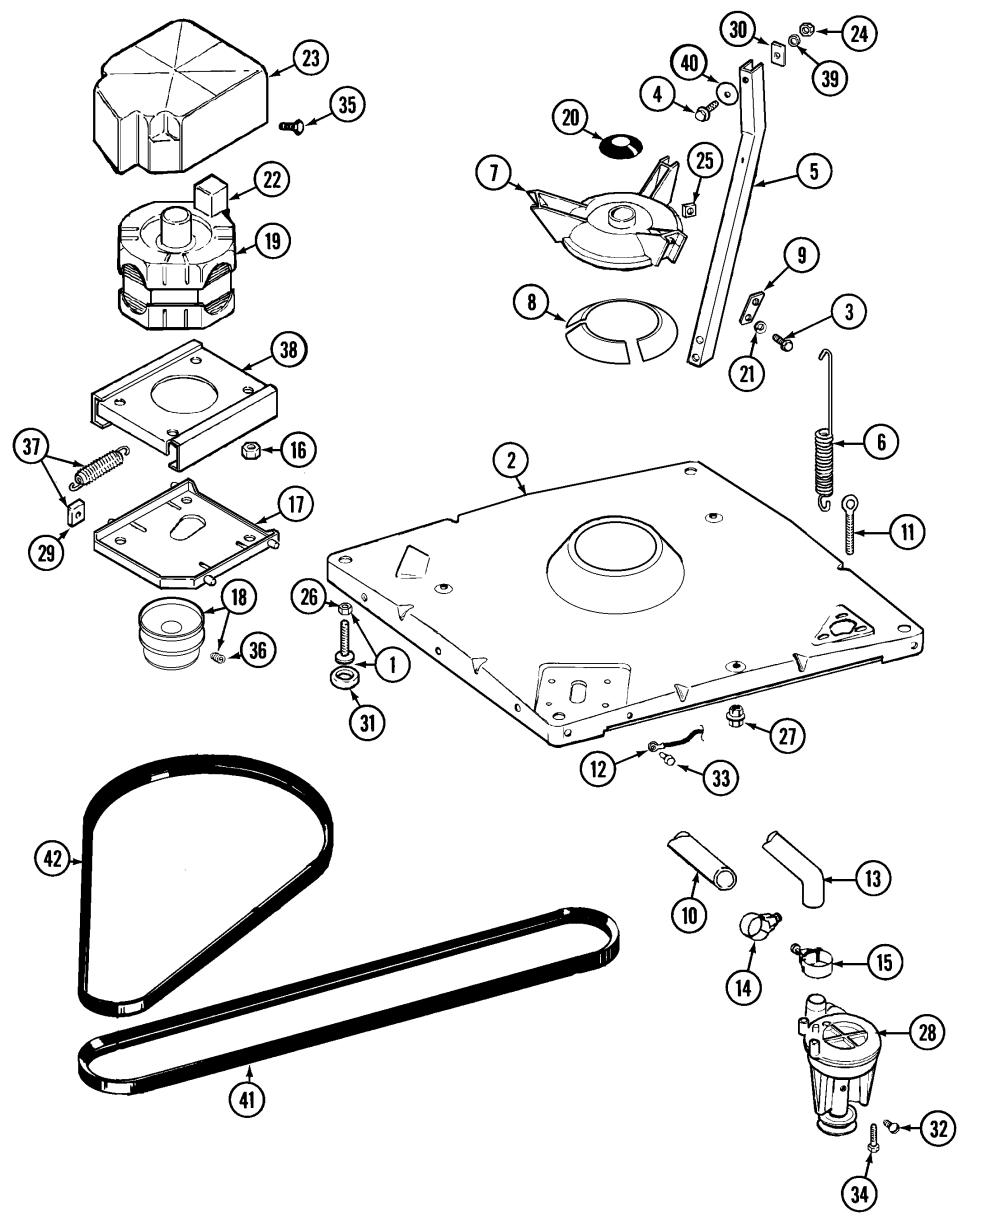 medium resolution of maytag washer wiring diagram wiring diagrammaytag model lat8234aae residential washers genuine parts model no a606 maytag